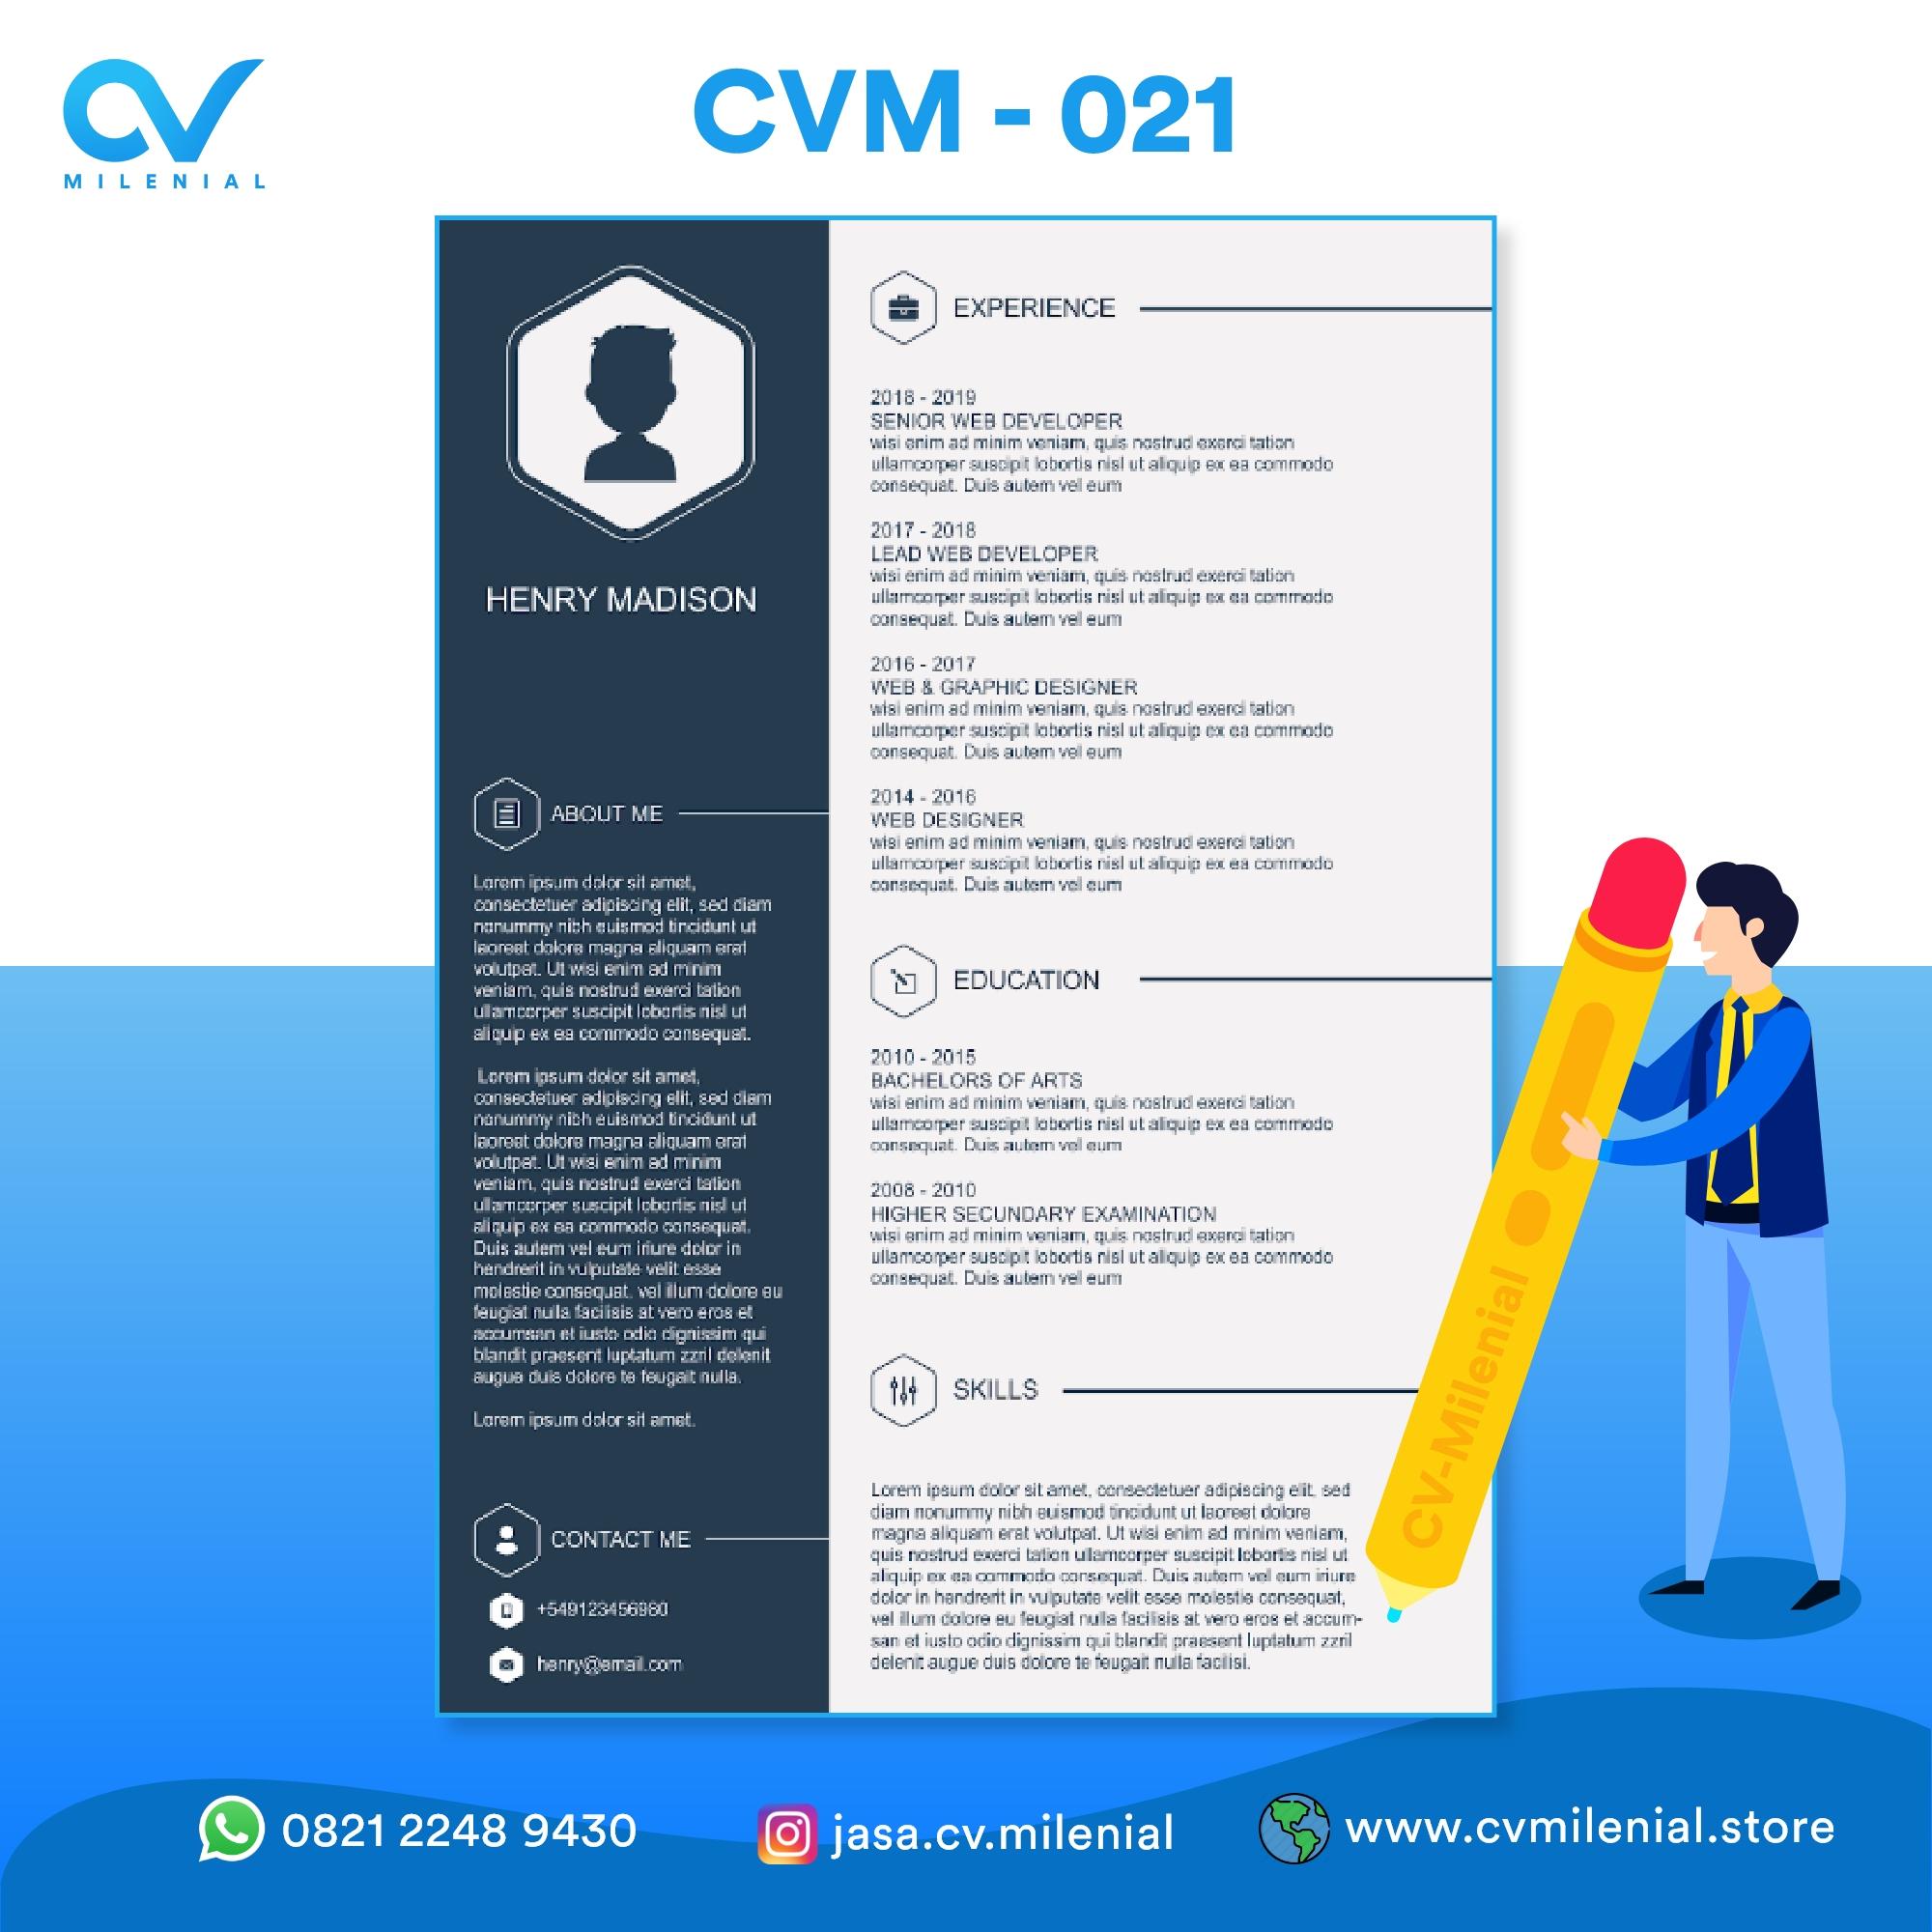 https://cvmilenial.com/assets/image/desain_cv/21.jpg